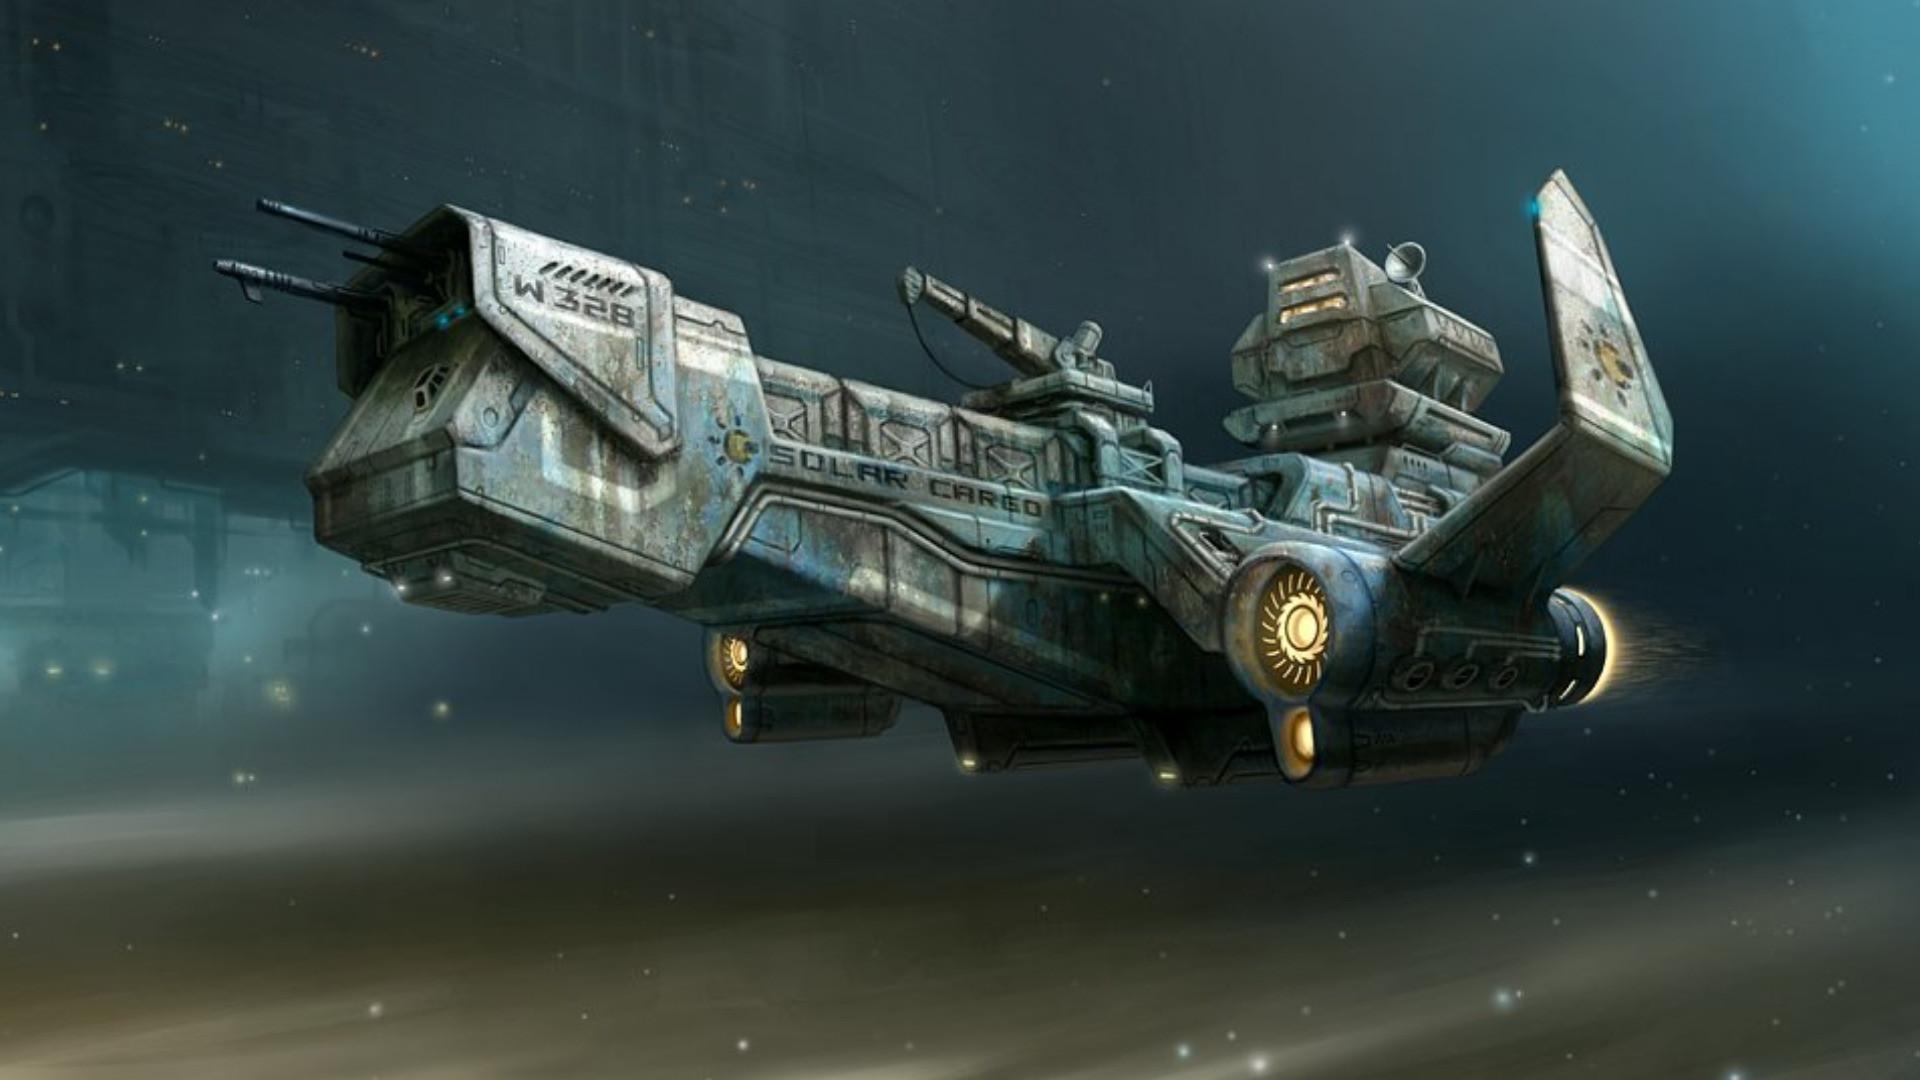 Sci Fi Spaceship Wallpaper (81+ Images